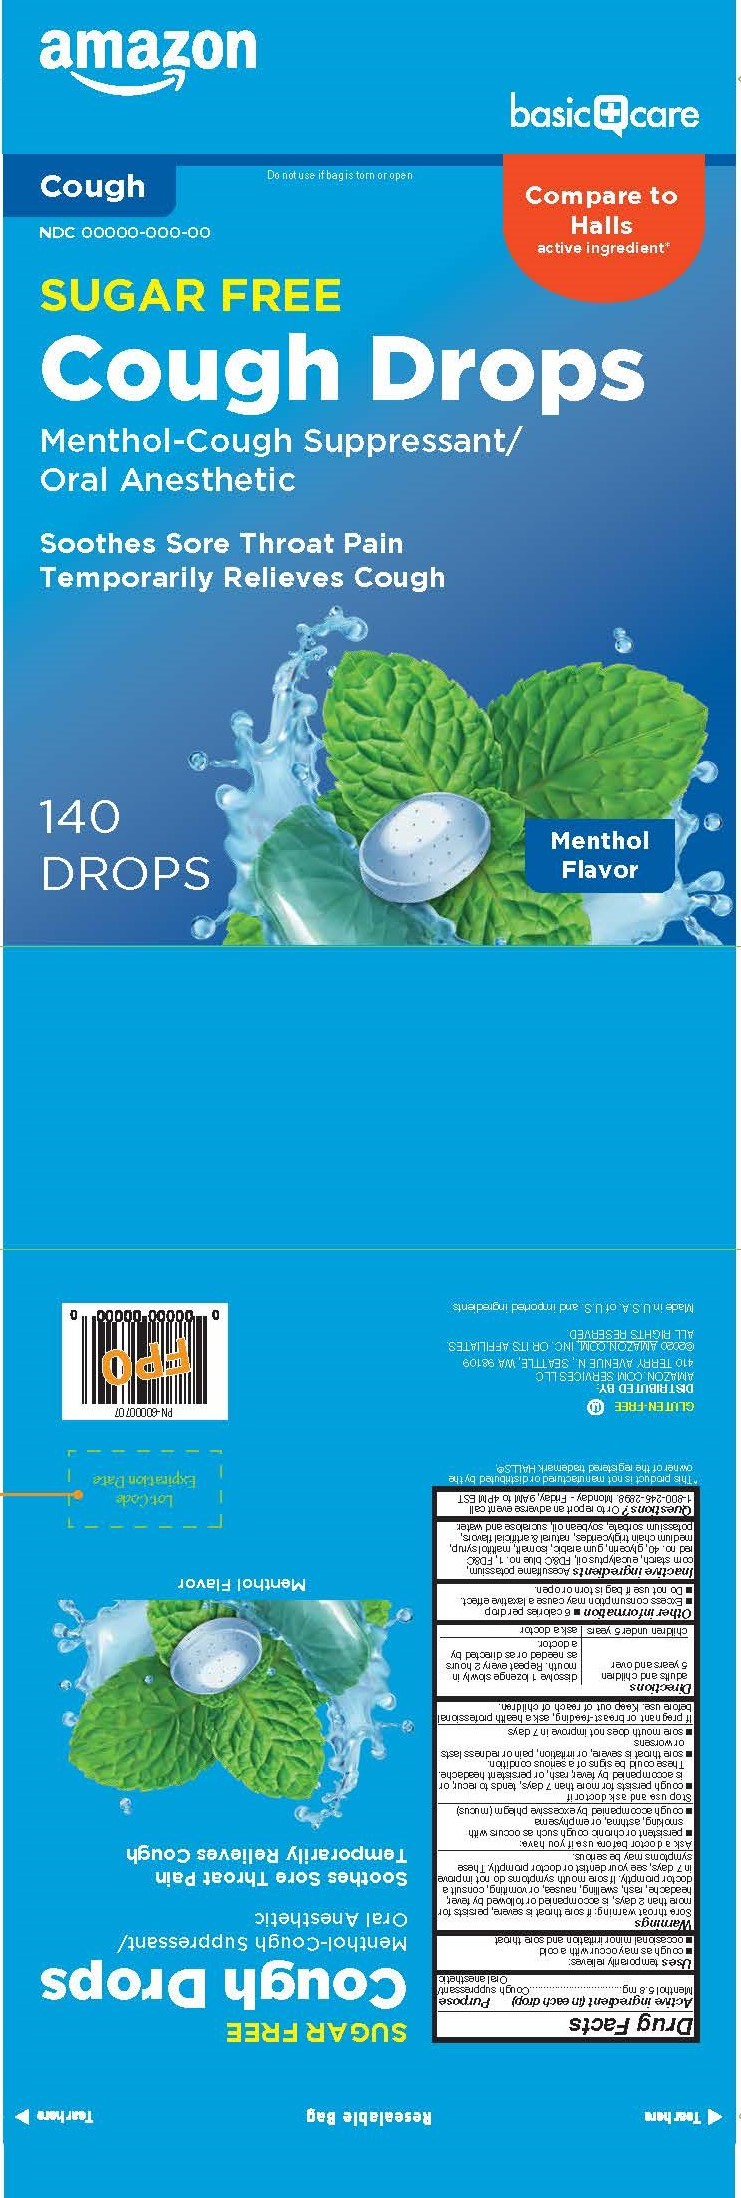 Basic Care SF Menthol 140ct Cough Drops